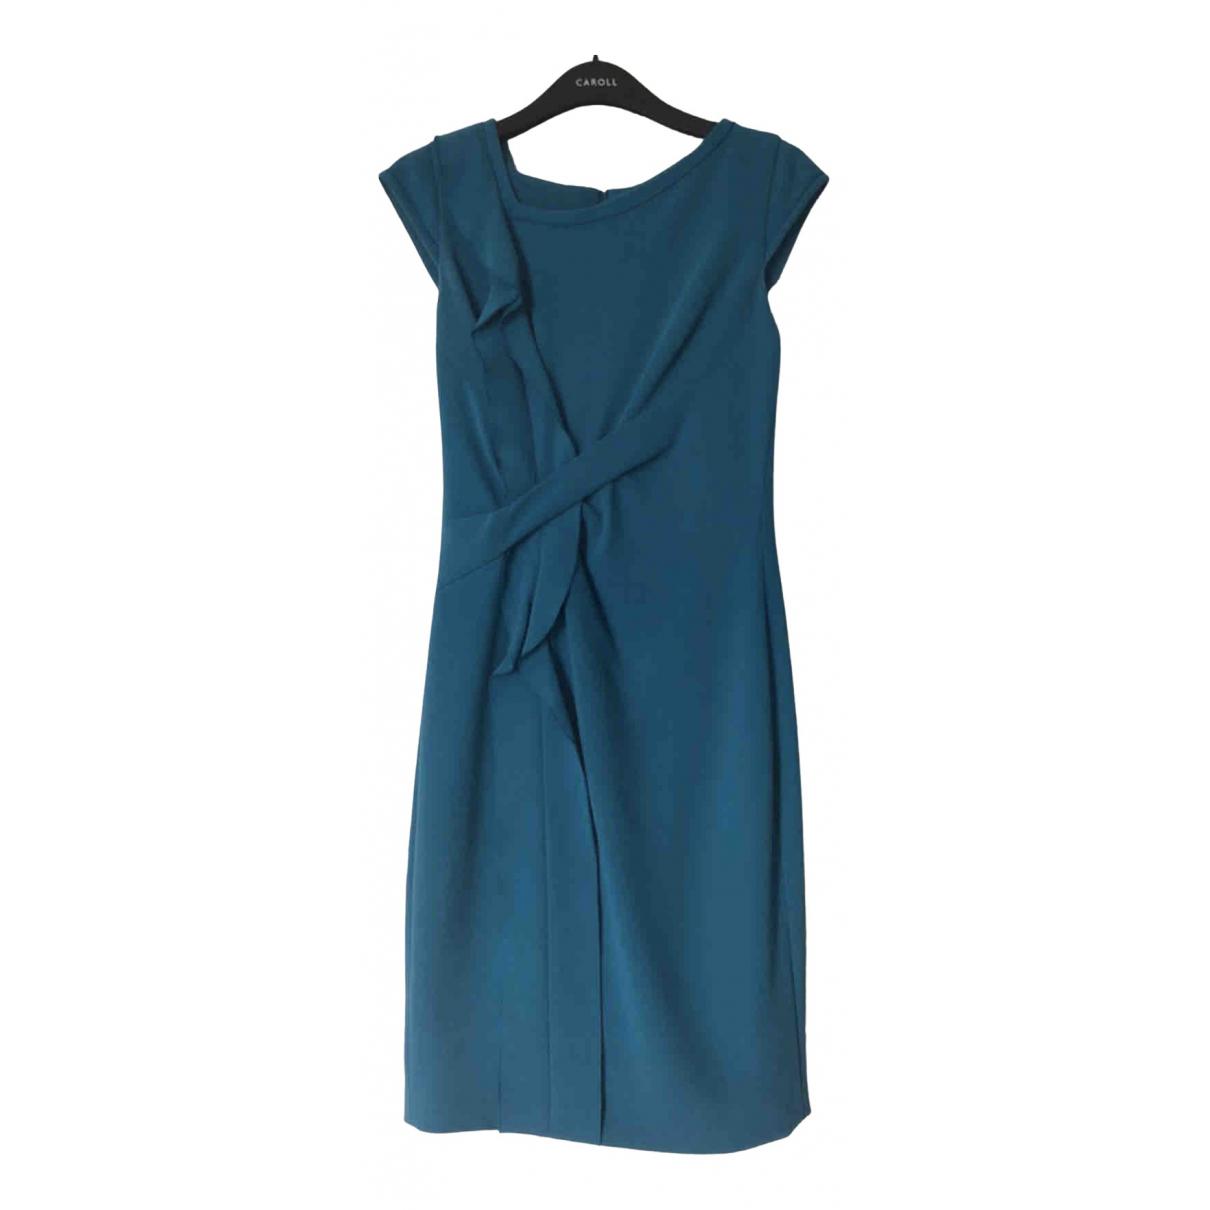 Karen Millen N Blue dress for Women 10 UK